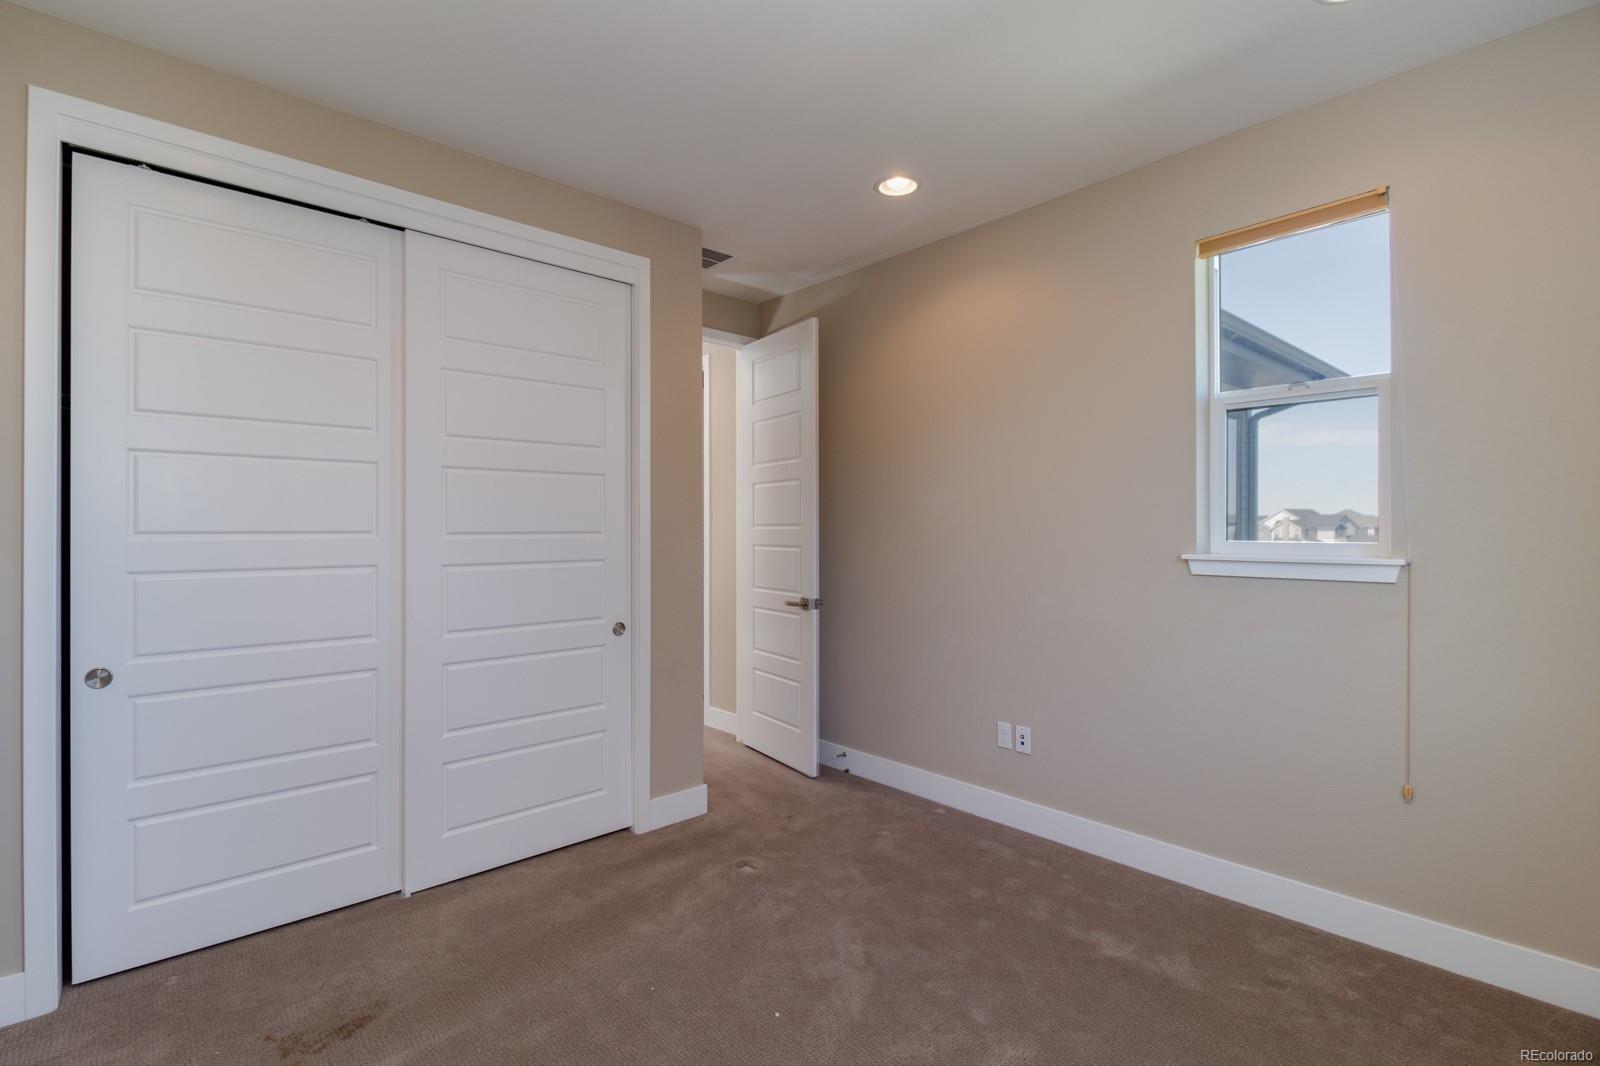 MLS# 3951846 - 1 - 8504  E 51st Avenue, Denver, CO 80238